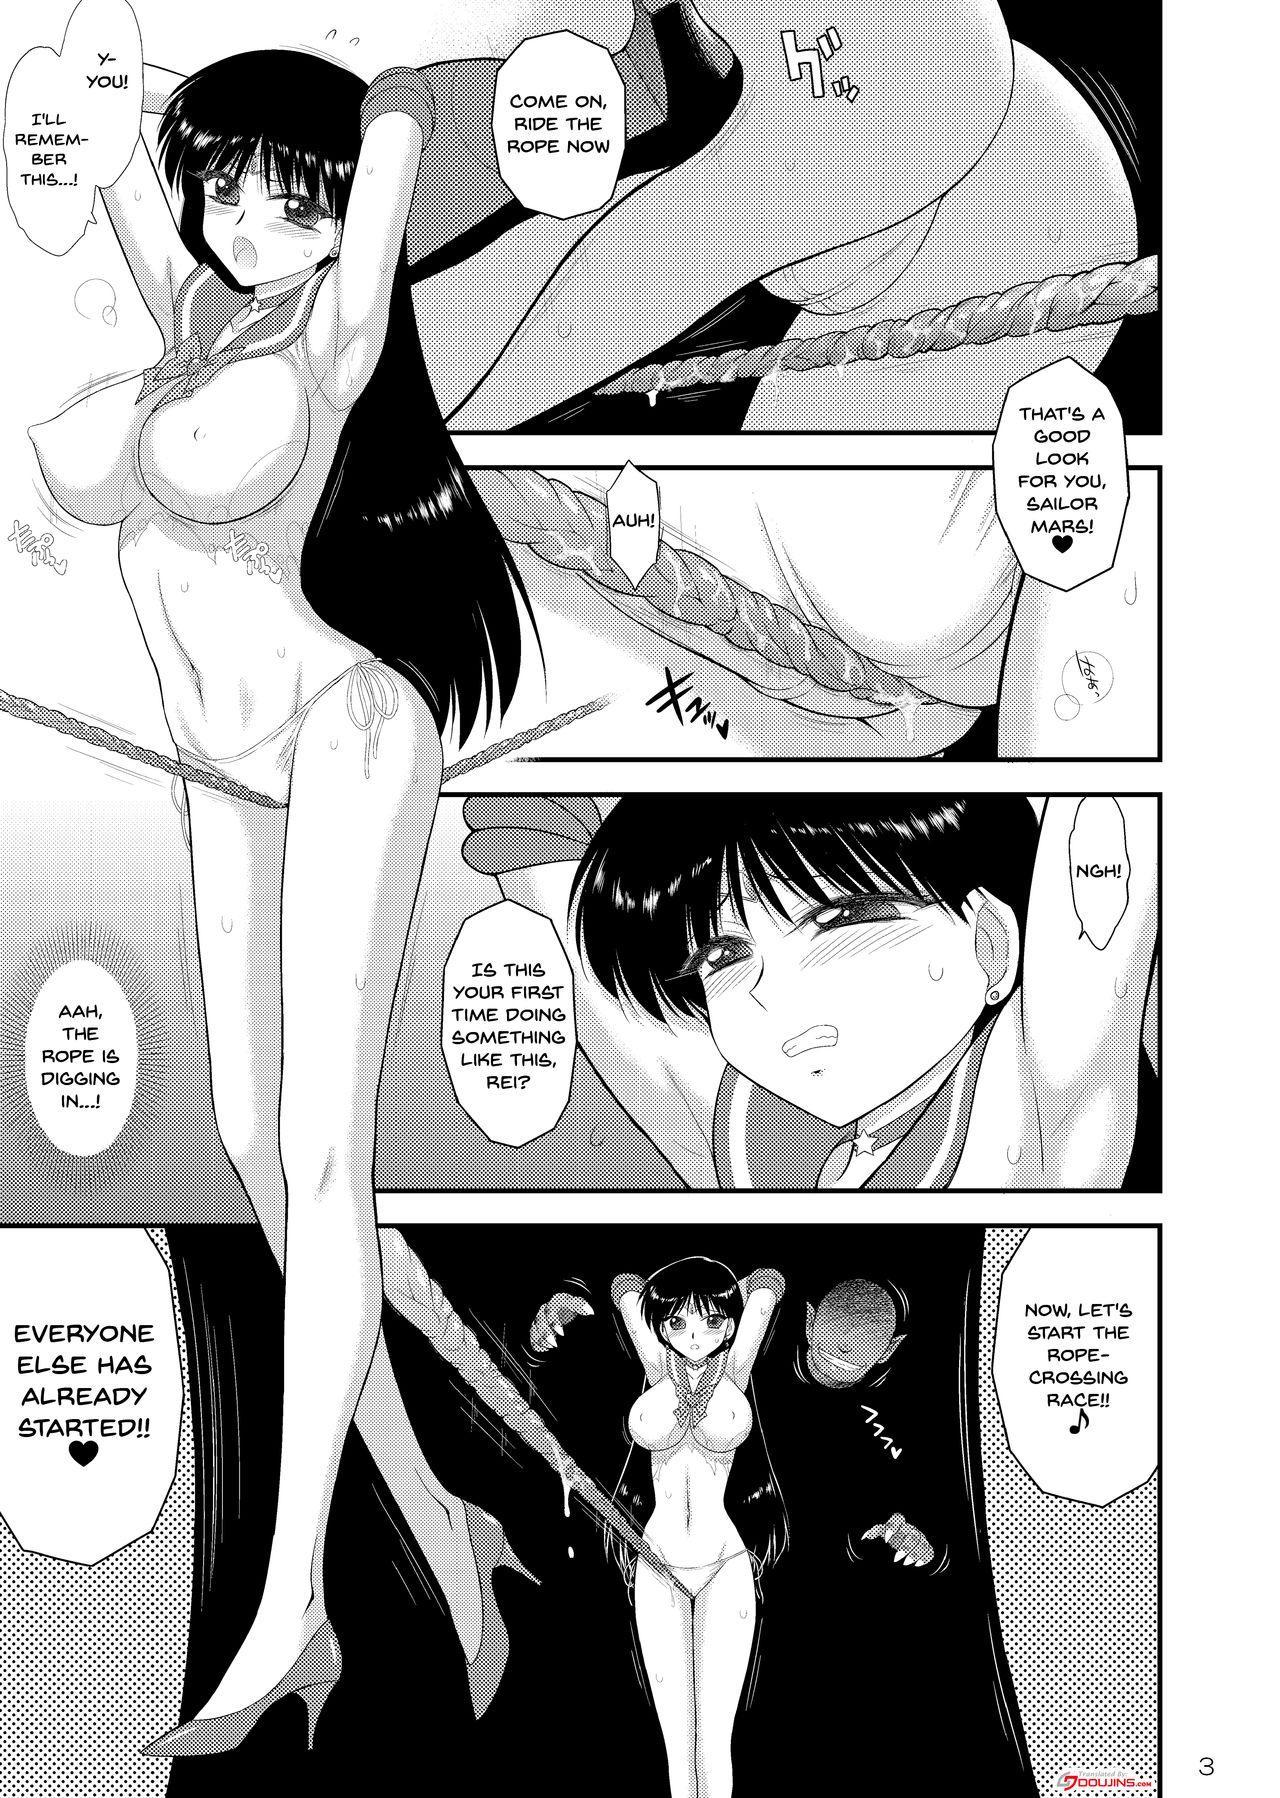 Bisoku Zenshin | Flirtation Sped Forward 1